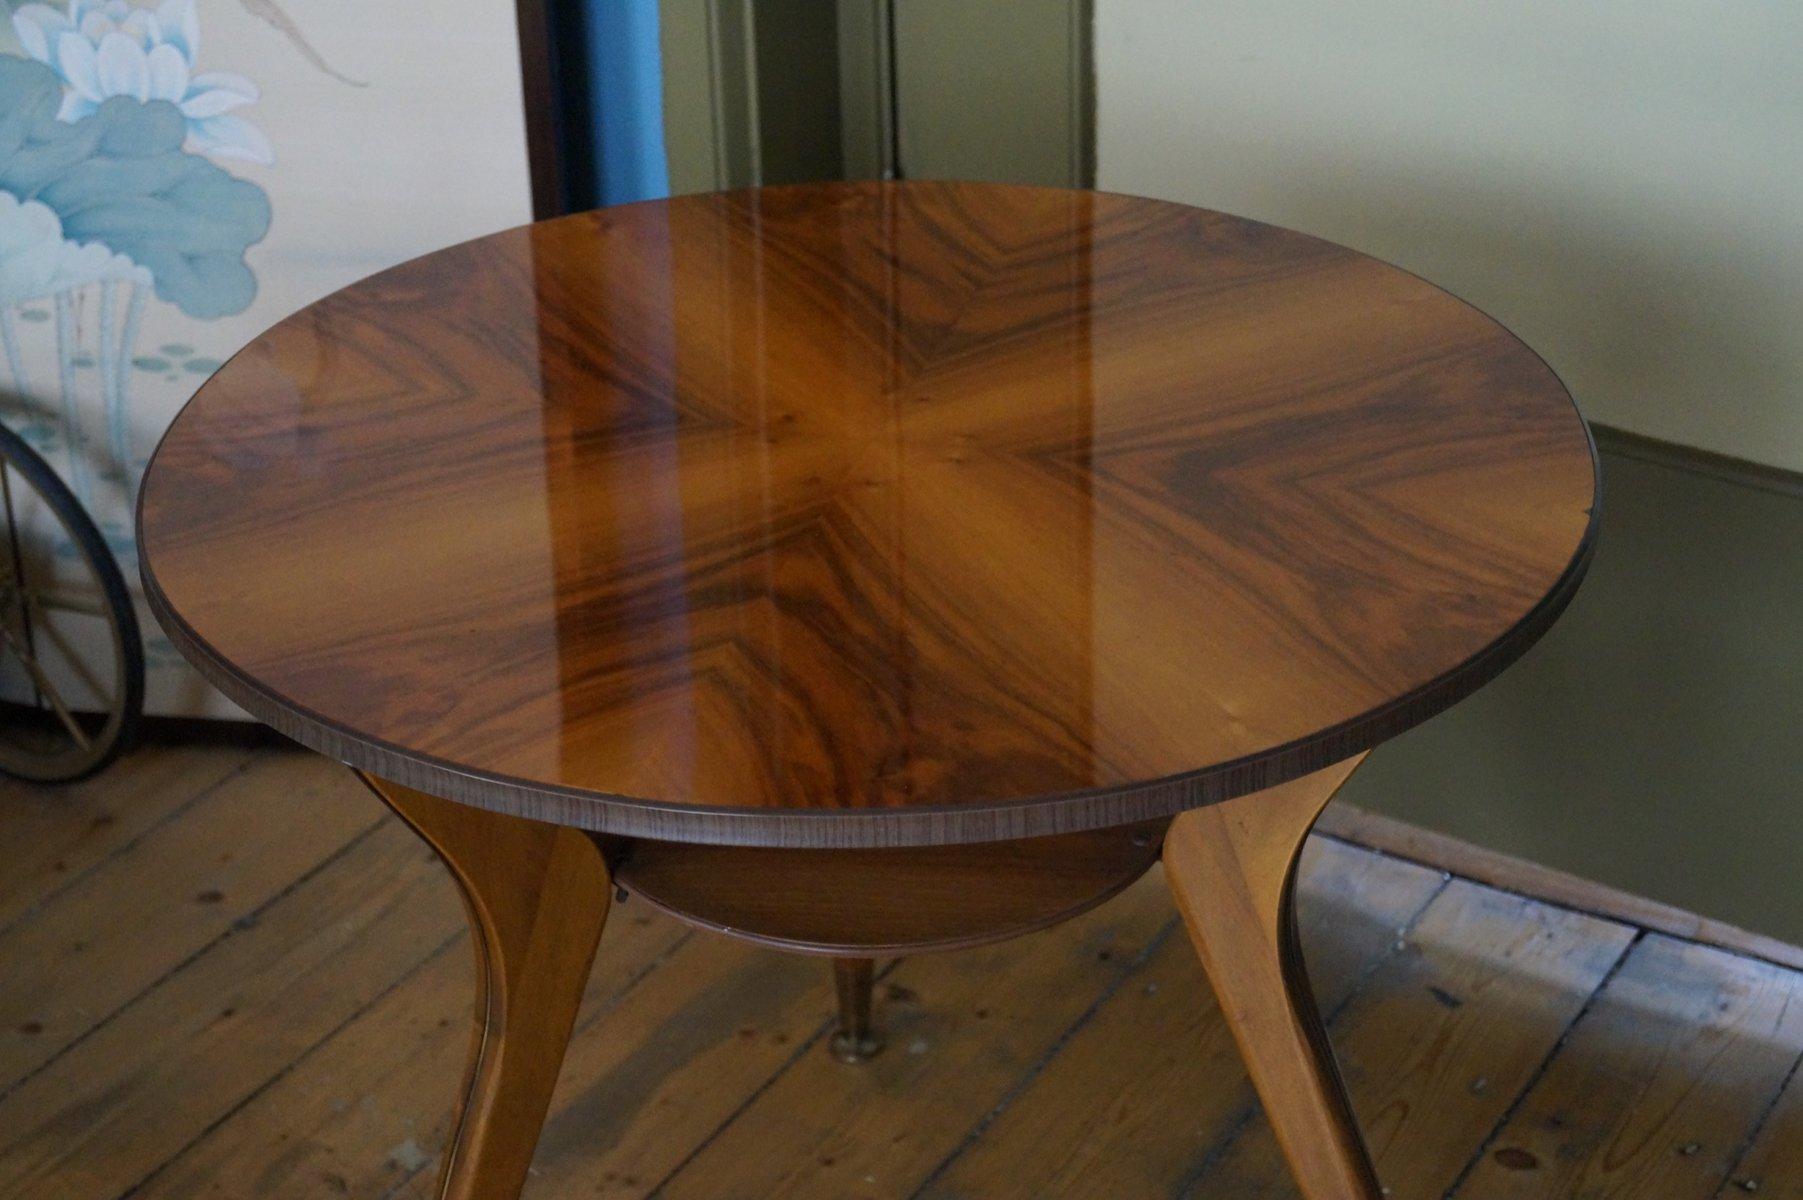 Italian Brass & Wood Veneer Coffee Table 1950s for sale at Pamono